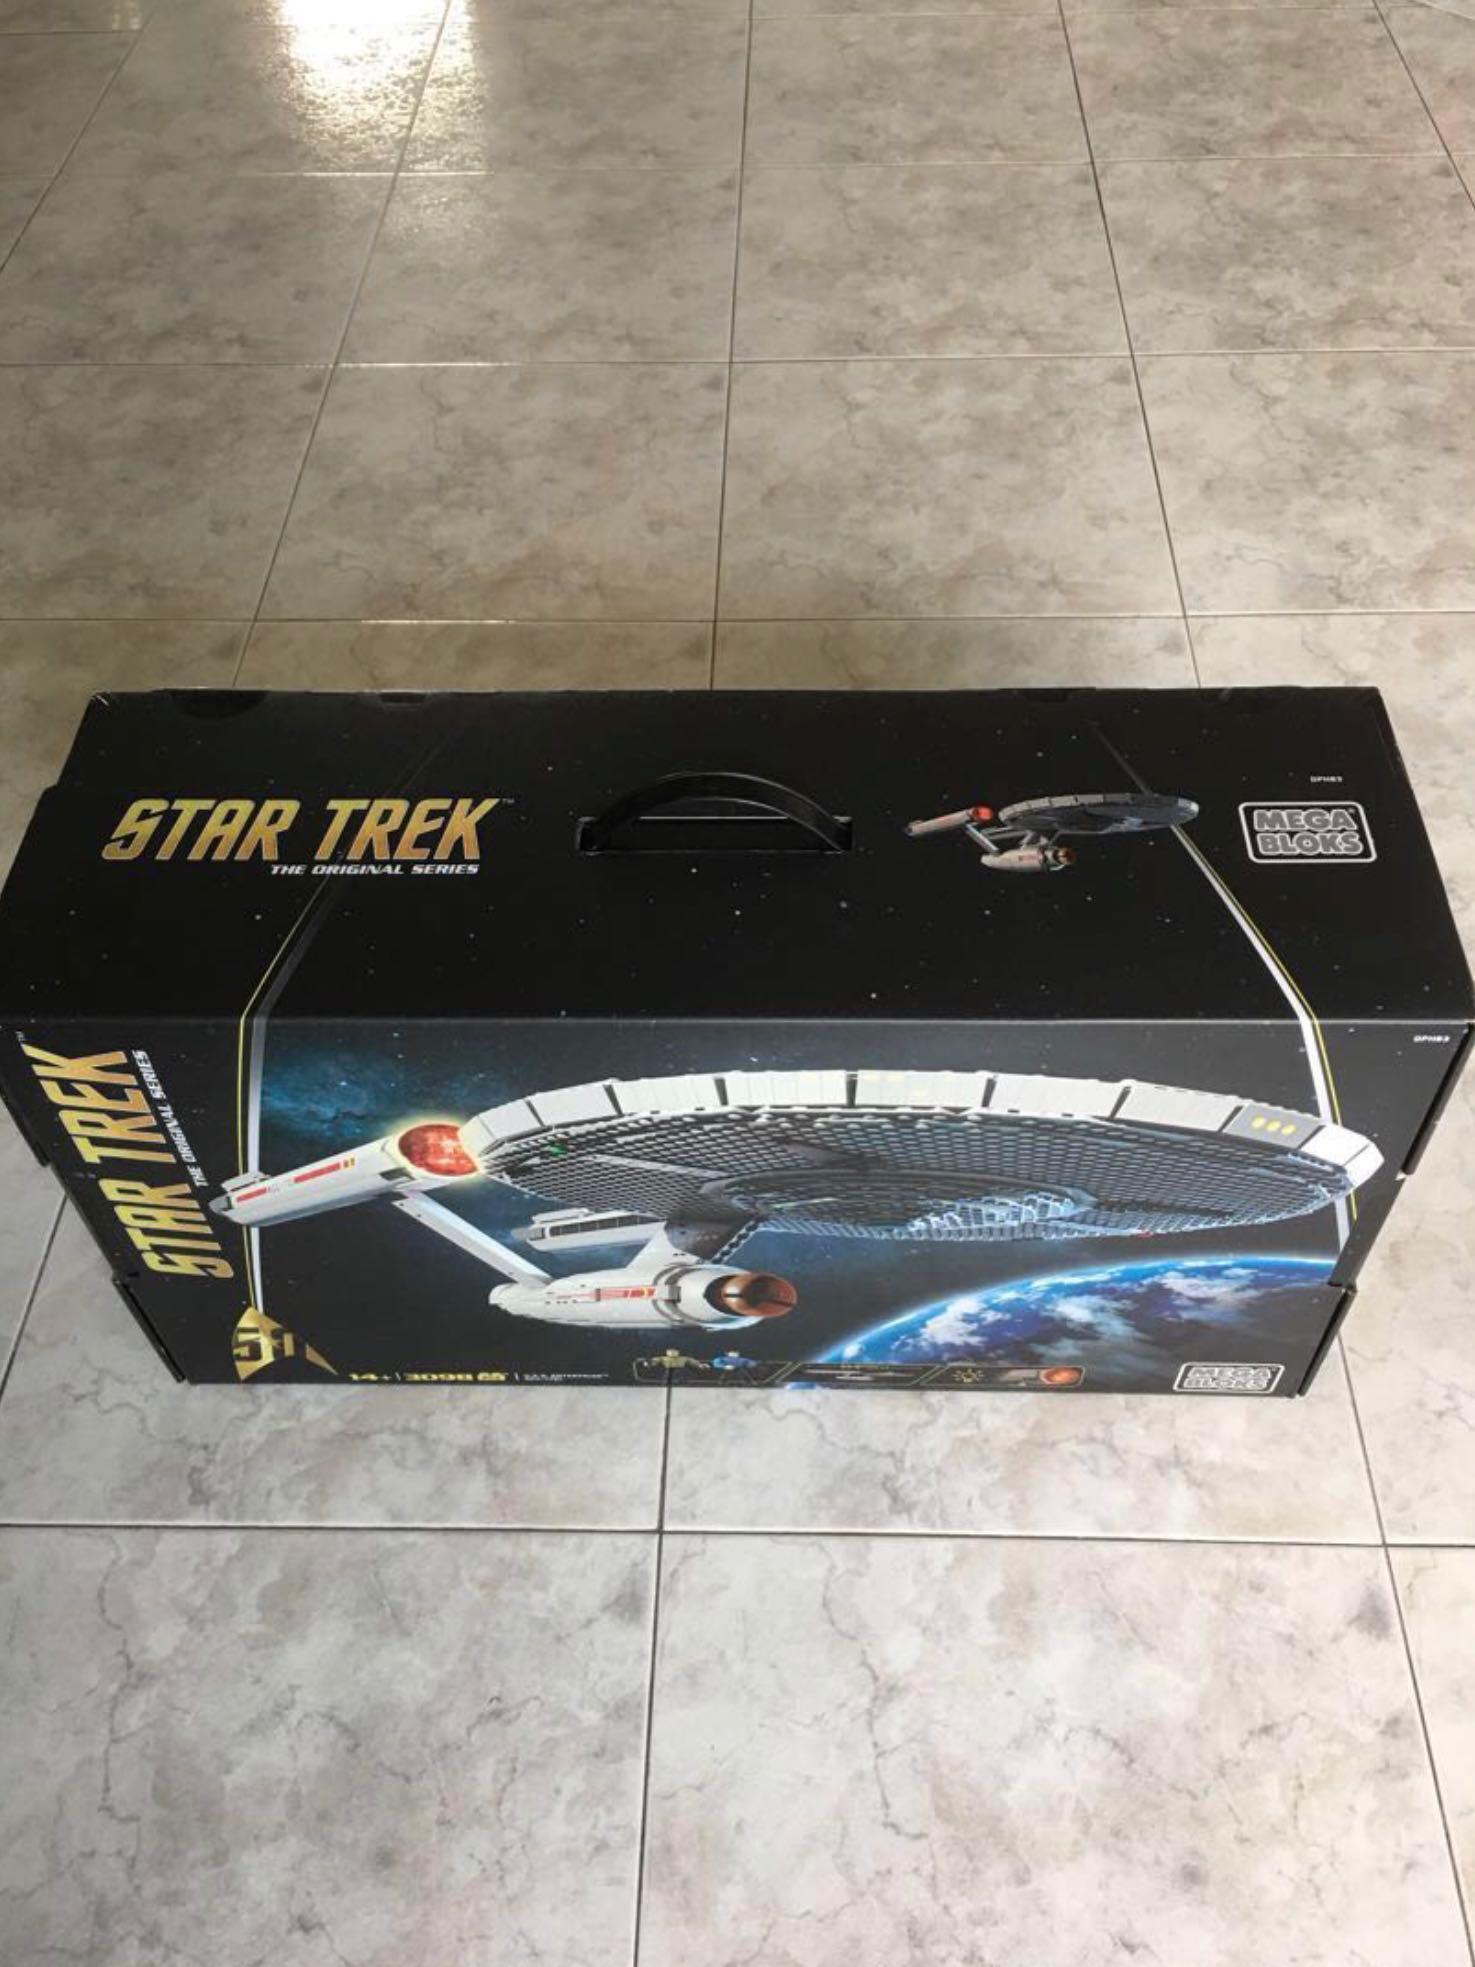 Enterprise Ncc-1701 Collector Construction Set New Mega Bloks Star Trek U.s.s